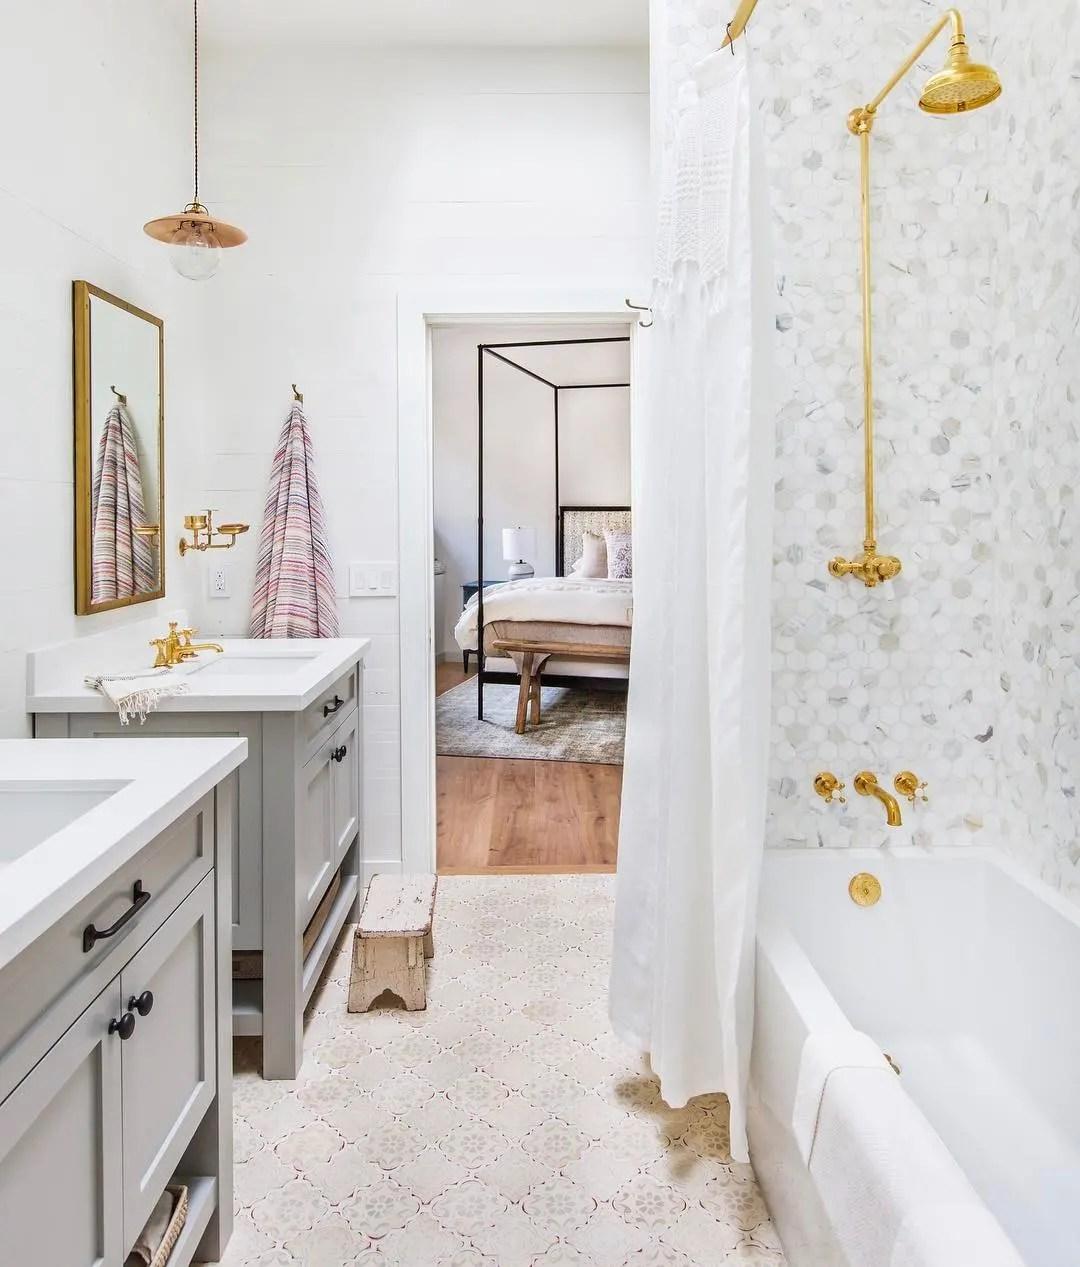 50 Best Bathroom Design Ideas | Apartment Therapy on Apartment Bathroom Ideas  id=99634